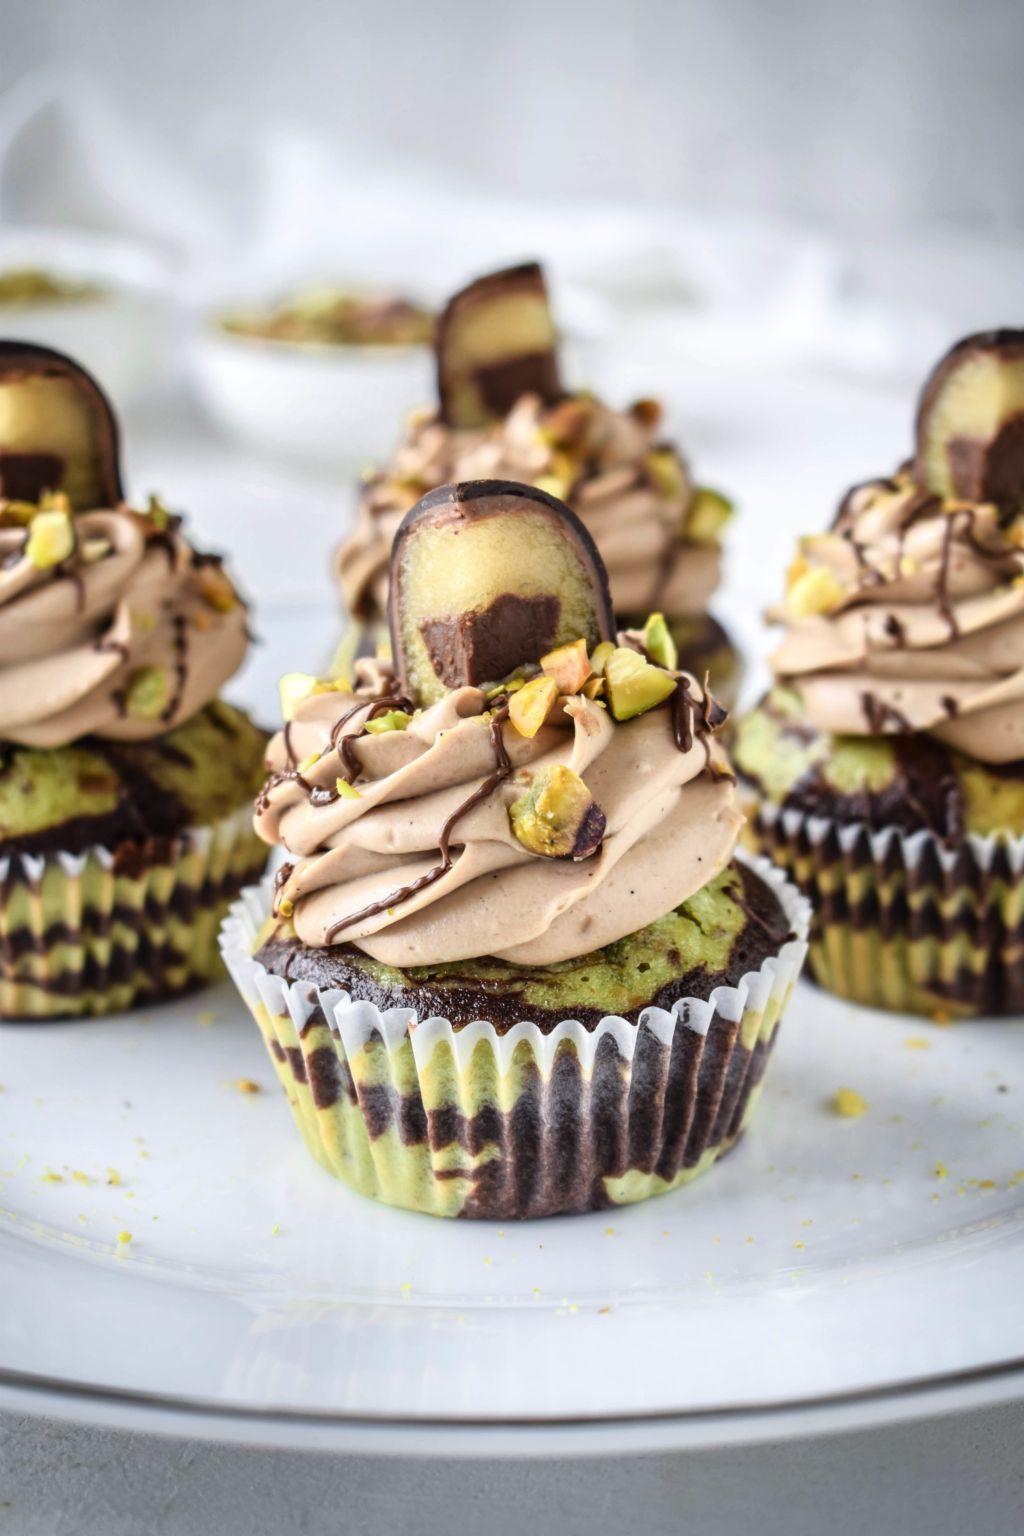 Mozartkugel Cupcakes mit Pistazien-Schoko Marmor Muffin #cupcakesrezepte